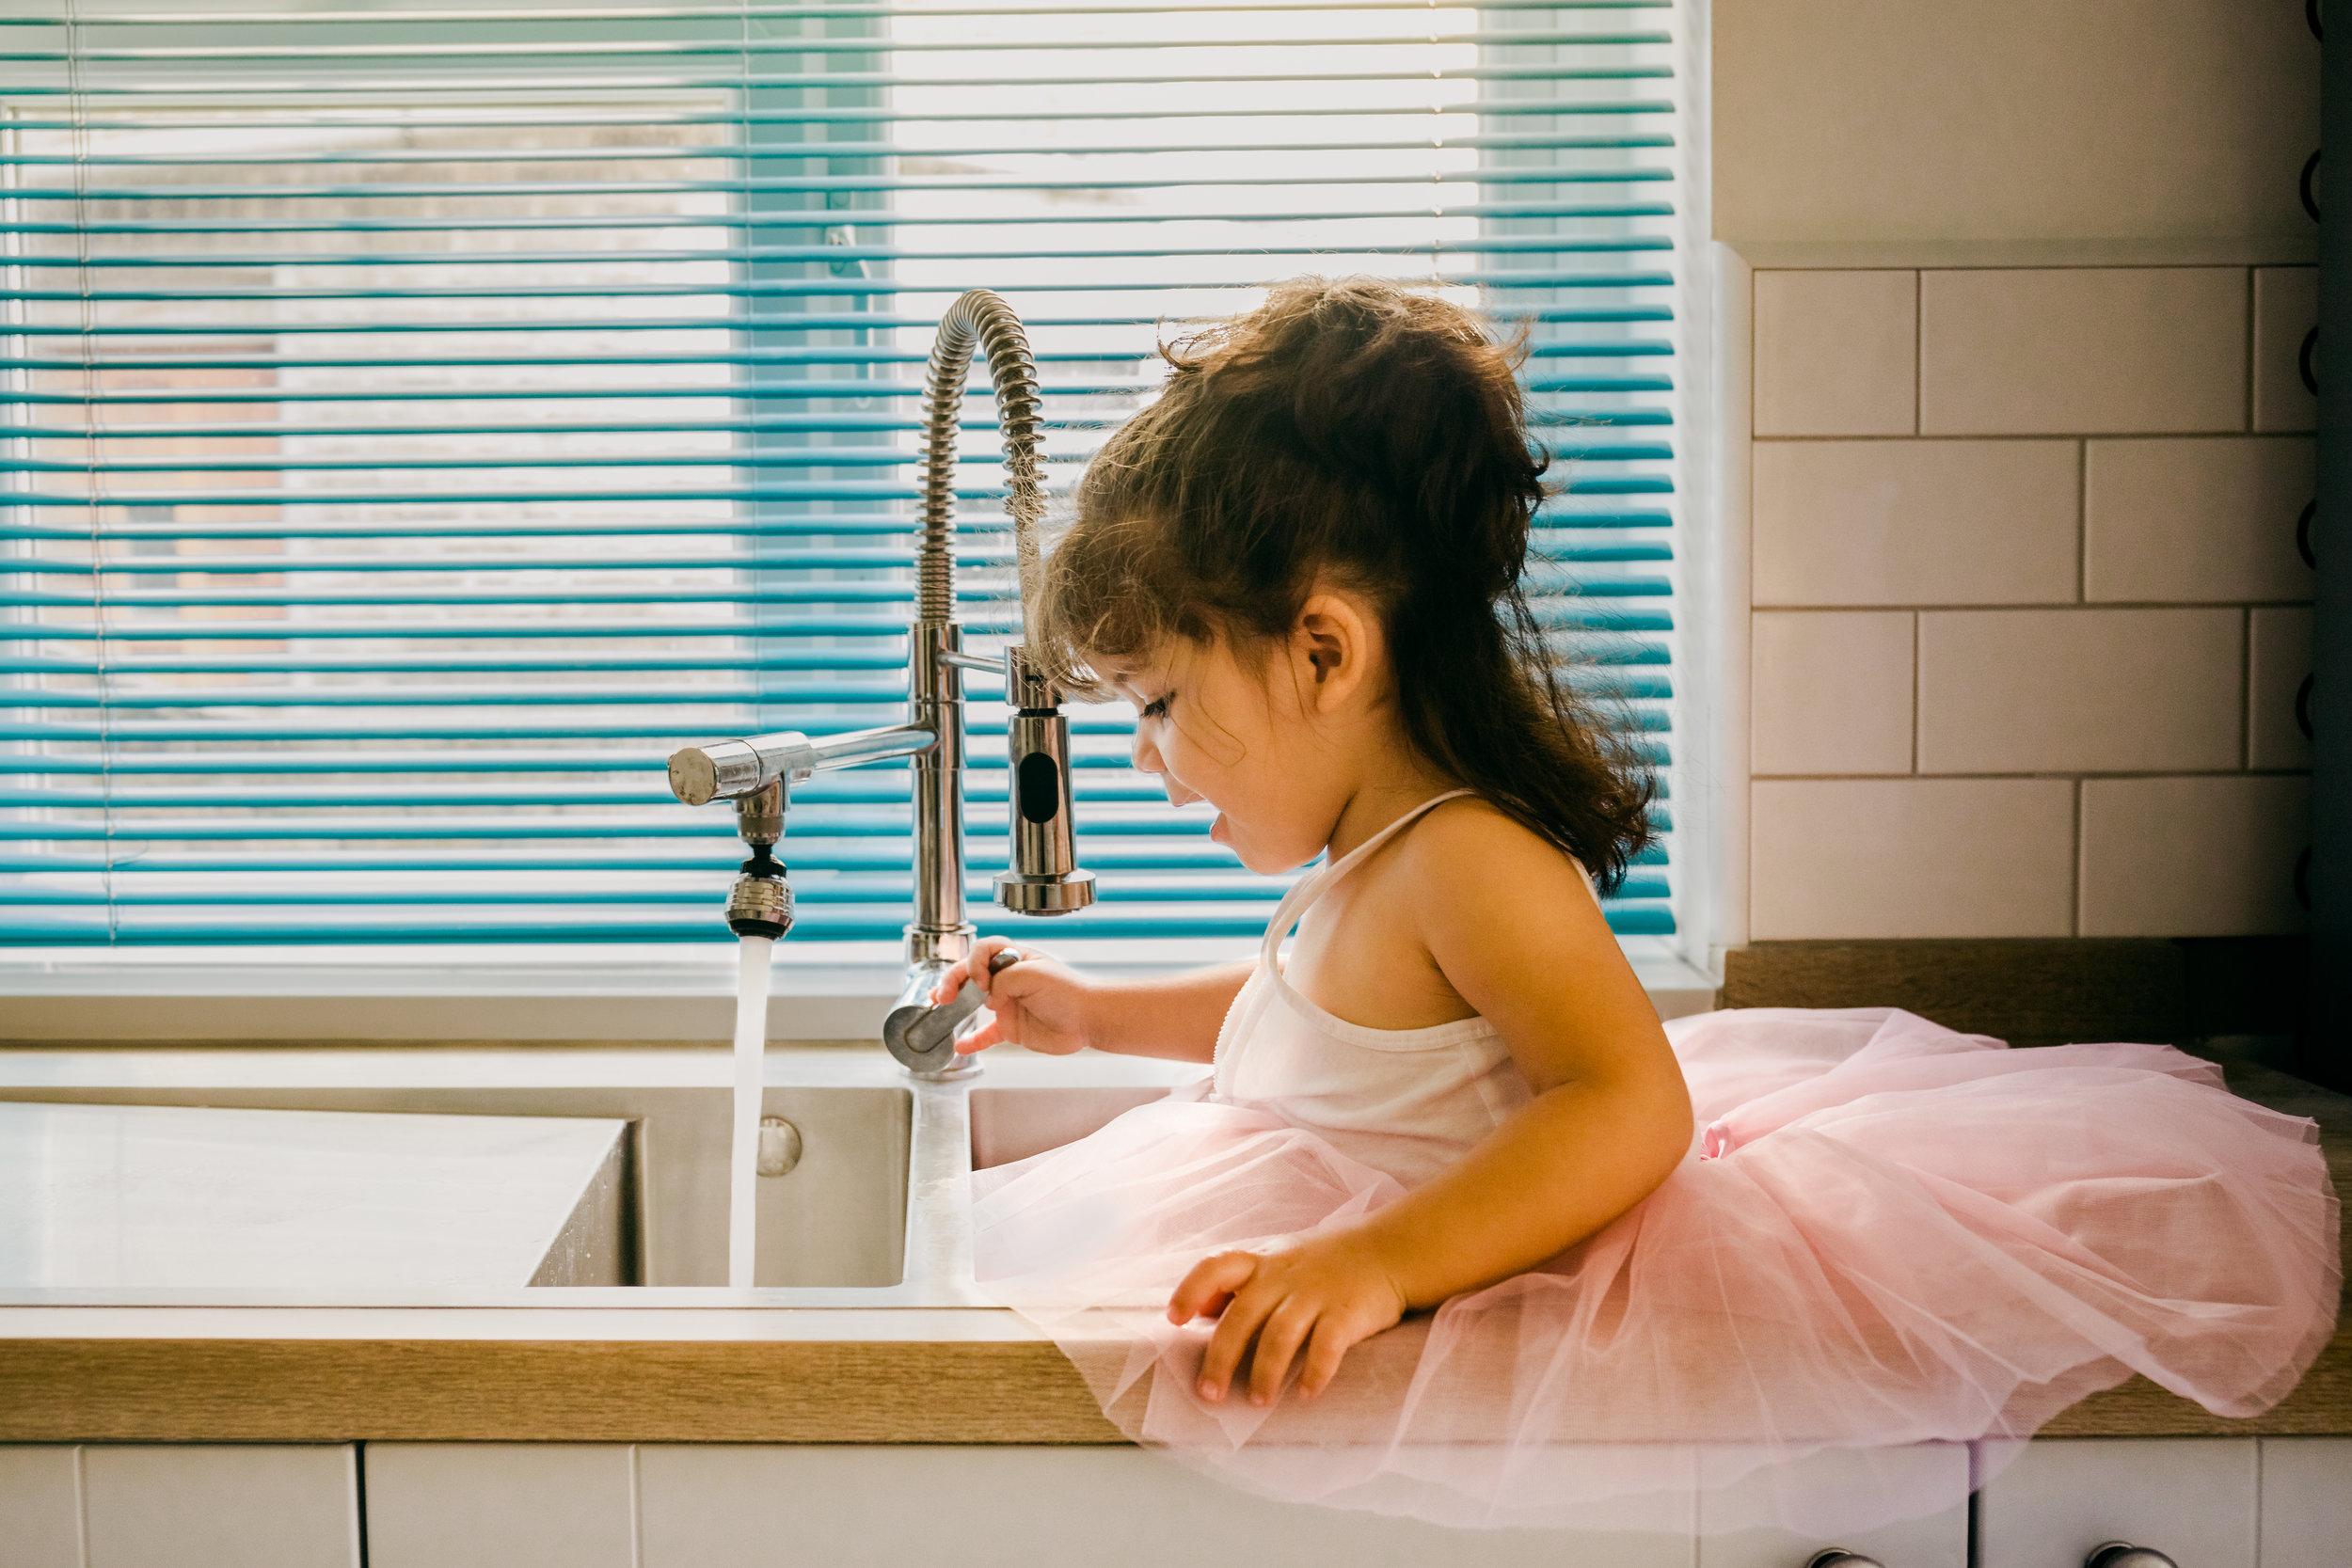 Pink Tutu & Sink Autumn 01a.jpg